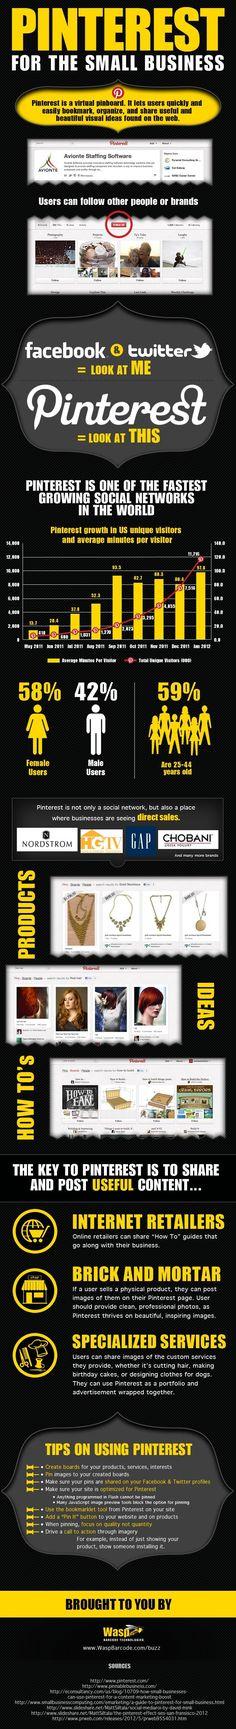 Pinterest 4 small #business follow @Sunil Kanderi Kanderi Pratap Singh [ Social Media Buddy]  for more stuffs